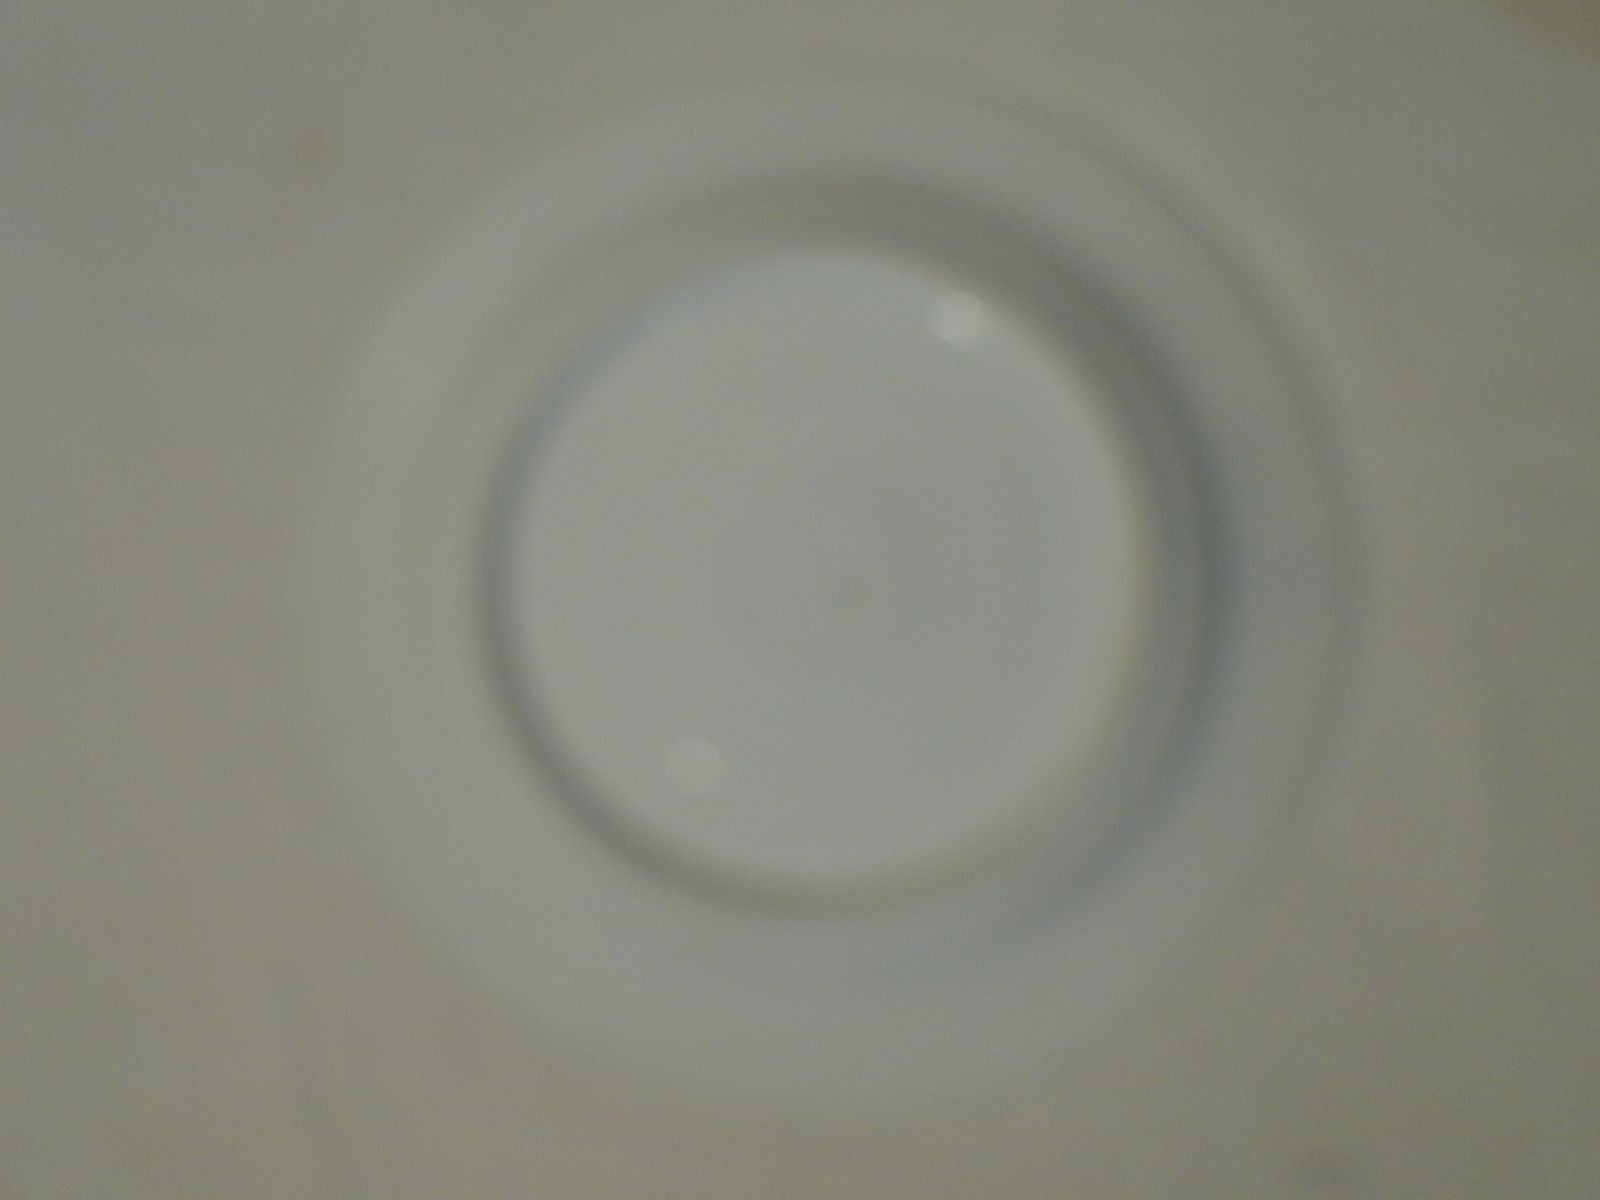 DSC06431.JPG (1600×1200)